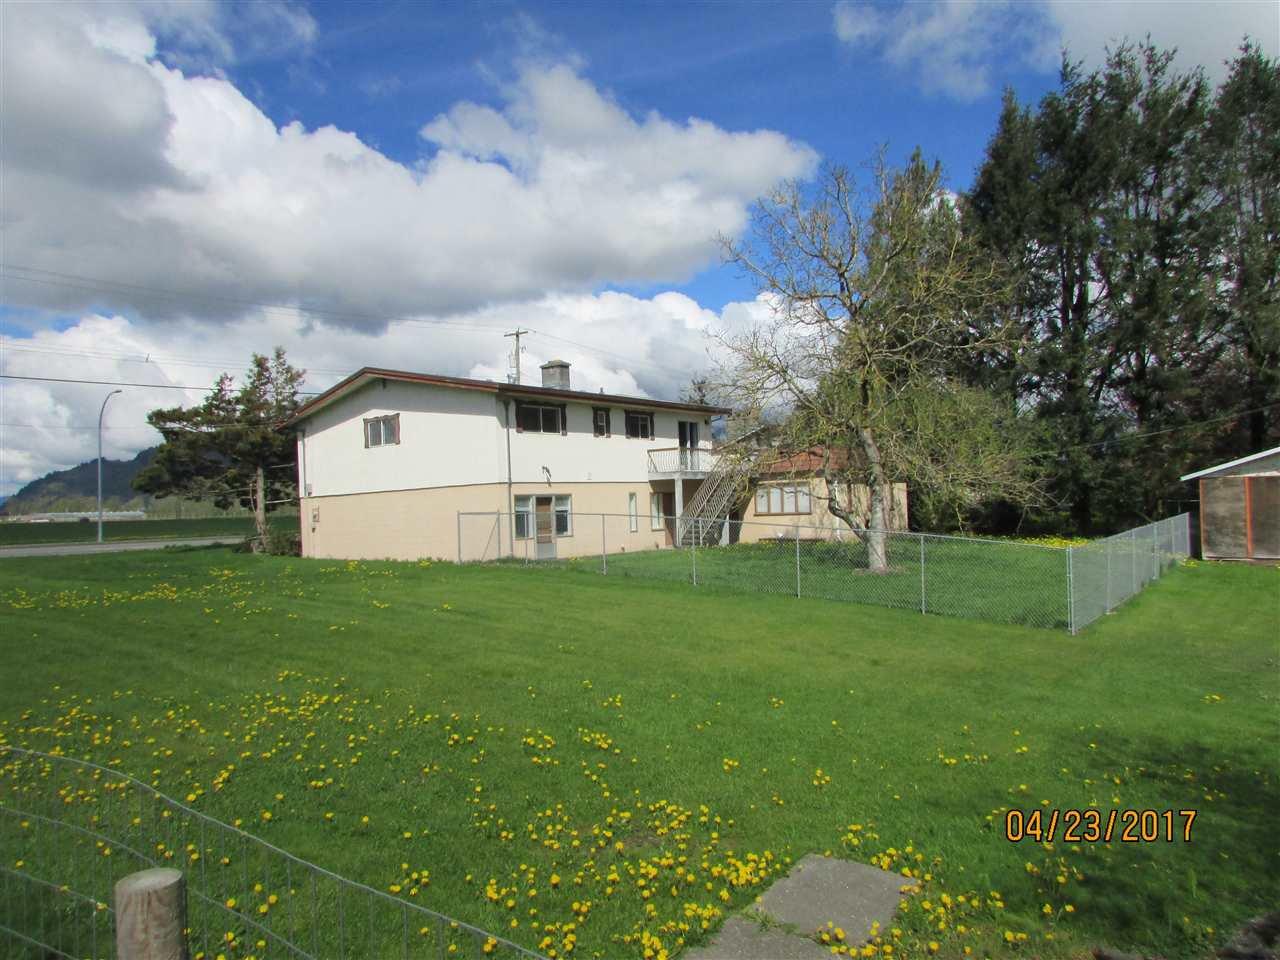 Photo 3: Photos: 7220 EVANS Road in Sardis: Sardis West Vedder Rd House for sale : MLS®# R2160379